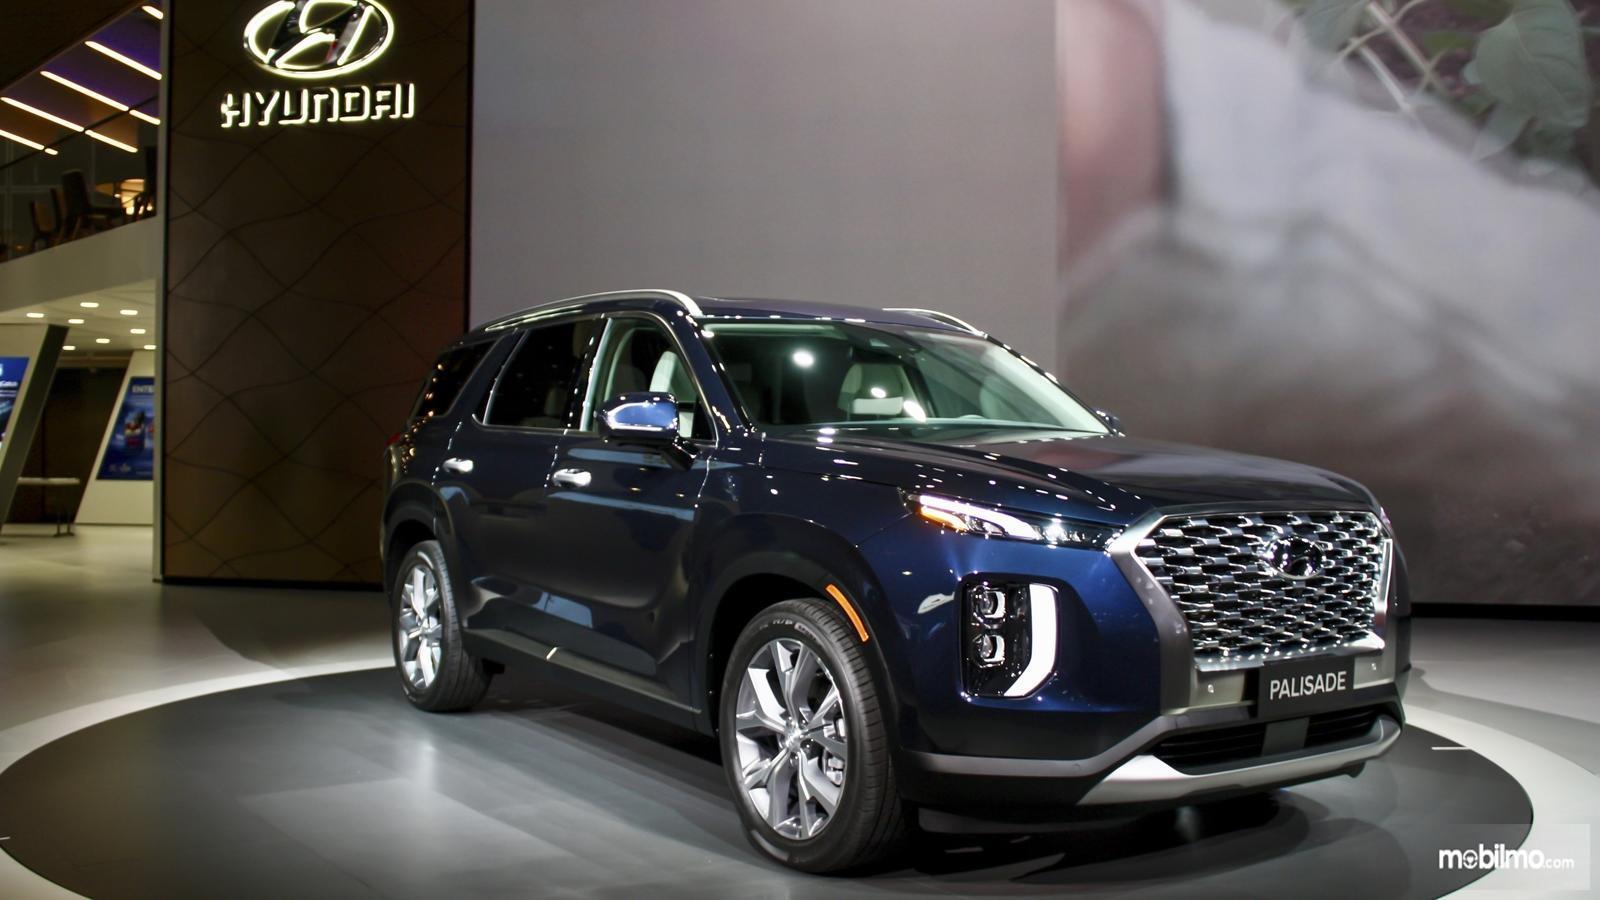 Gambar mobil Hyundai Palisade 2019 berwarna biru tua saat dipamerkan